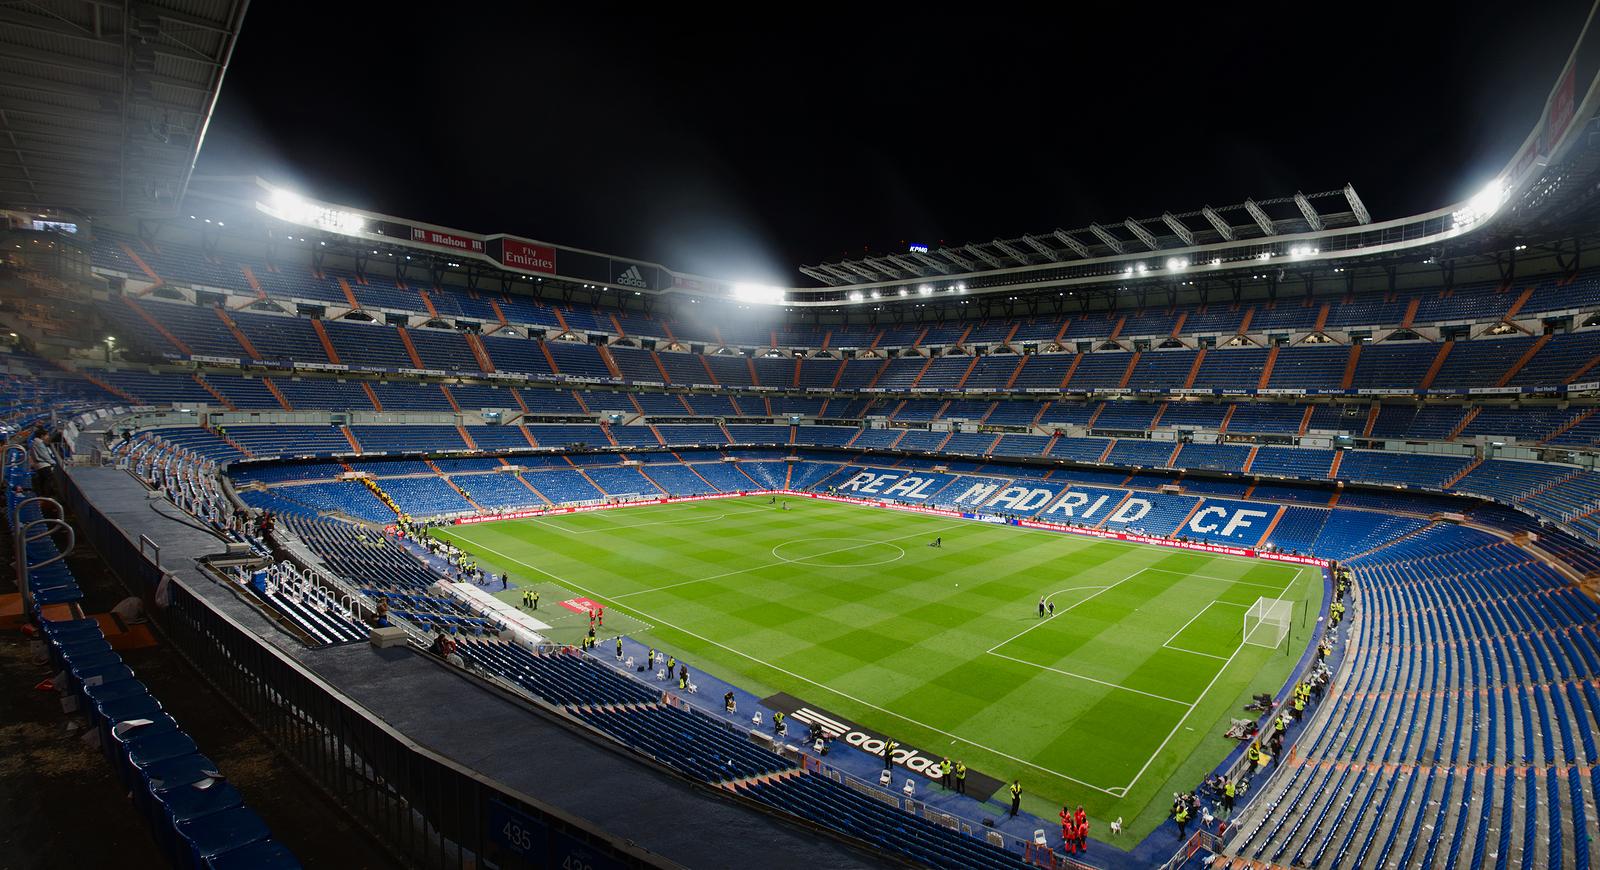 Night view of Santiago Bernabeu stadium